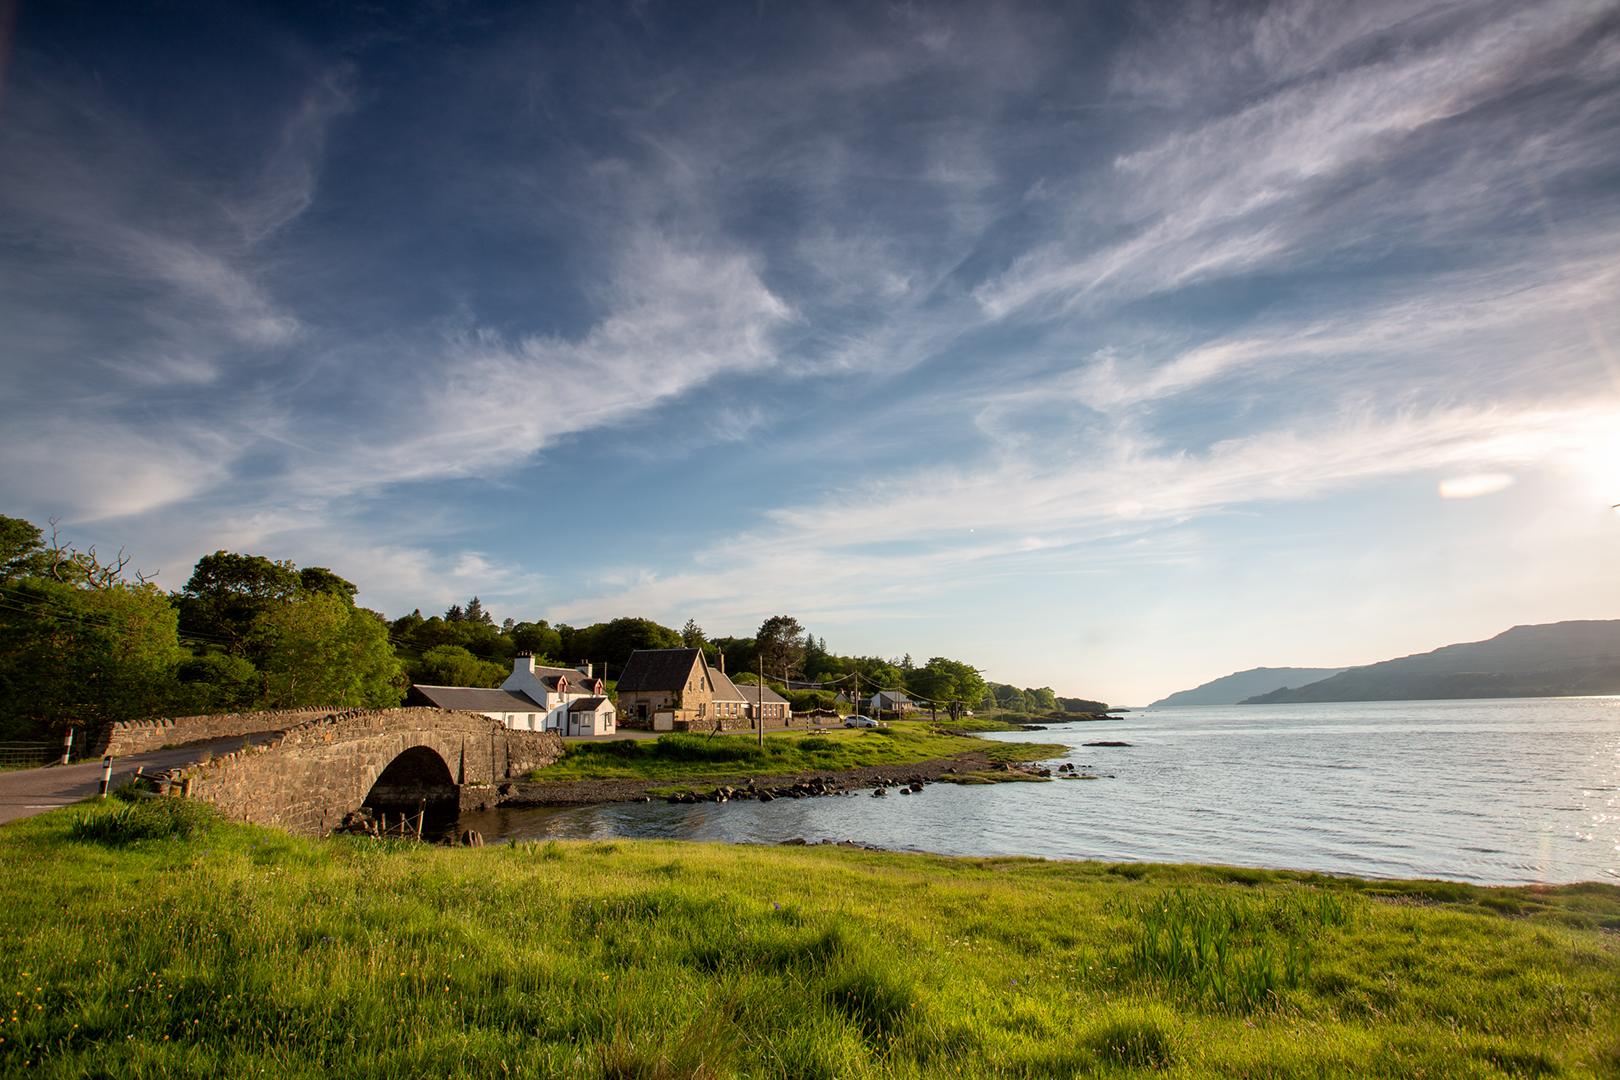 Isle of Mull_Schottland_Wohnmobil_Campen